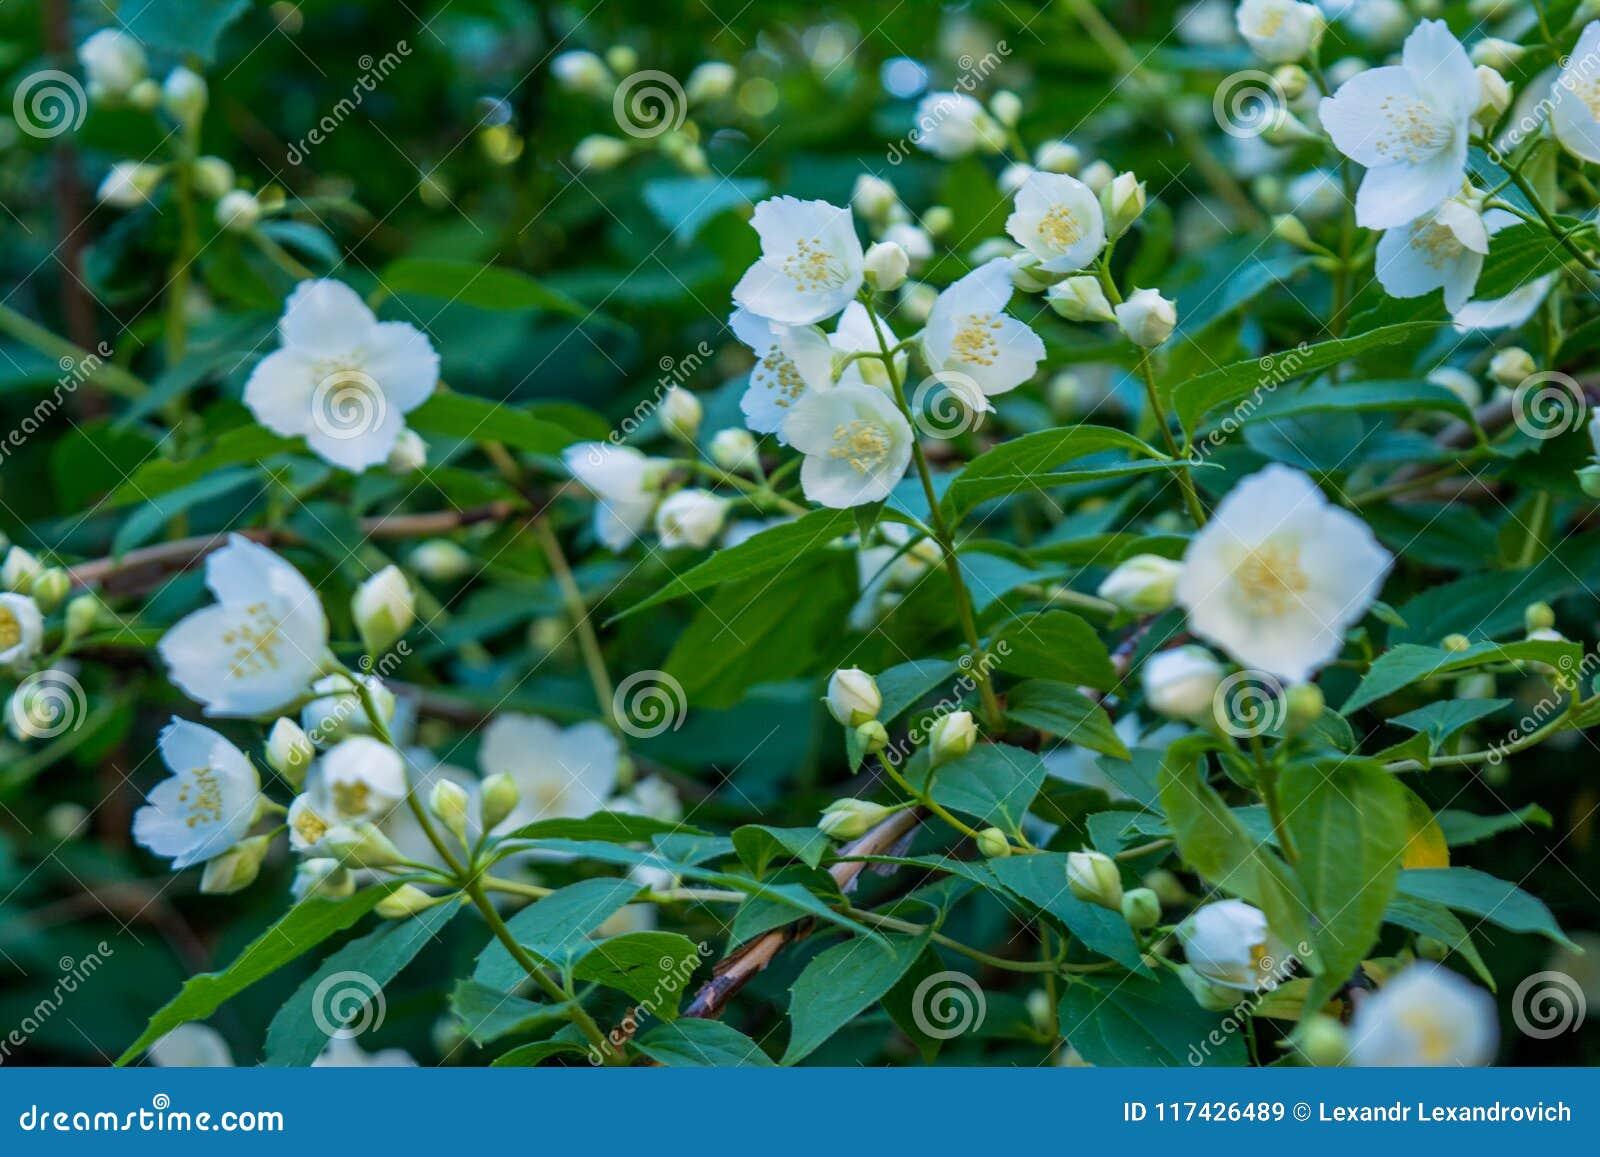 Beautiful Amazing White Jasmine Flowers On The Bush In The Garden